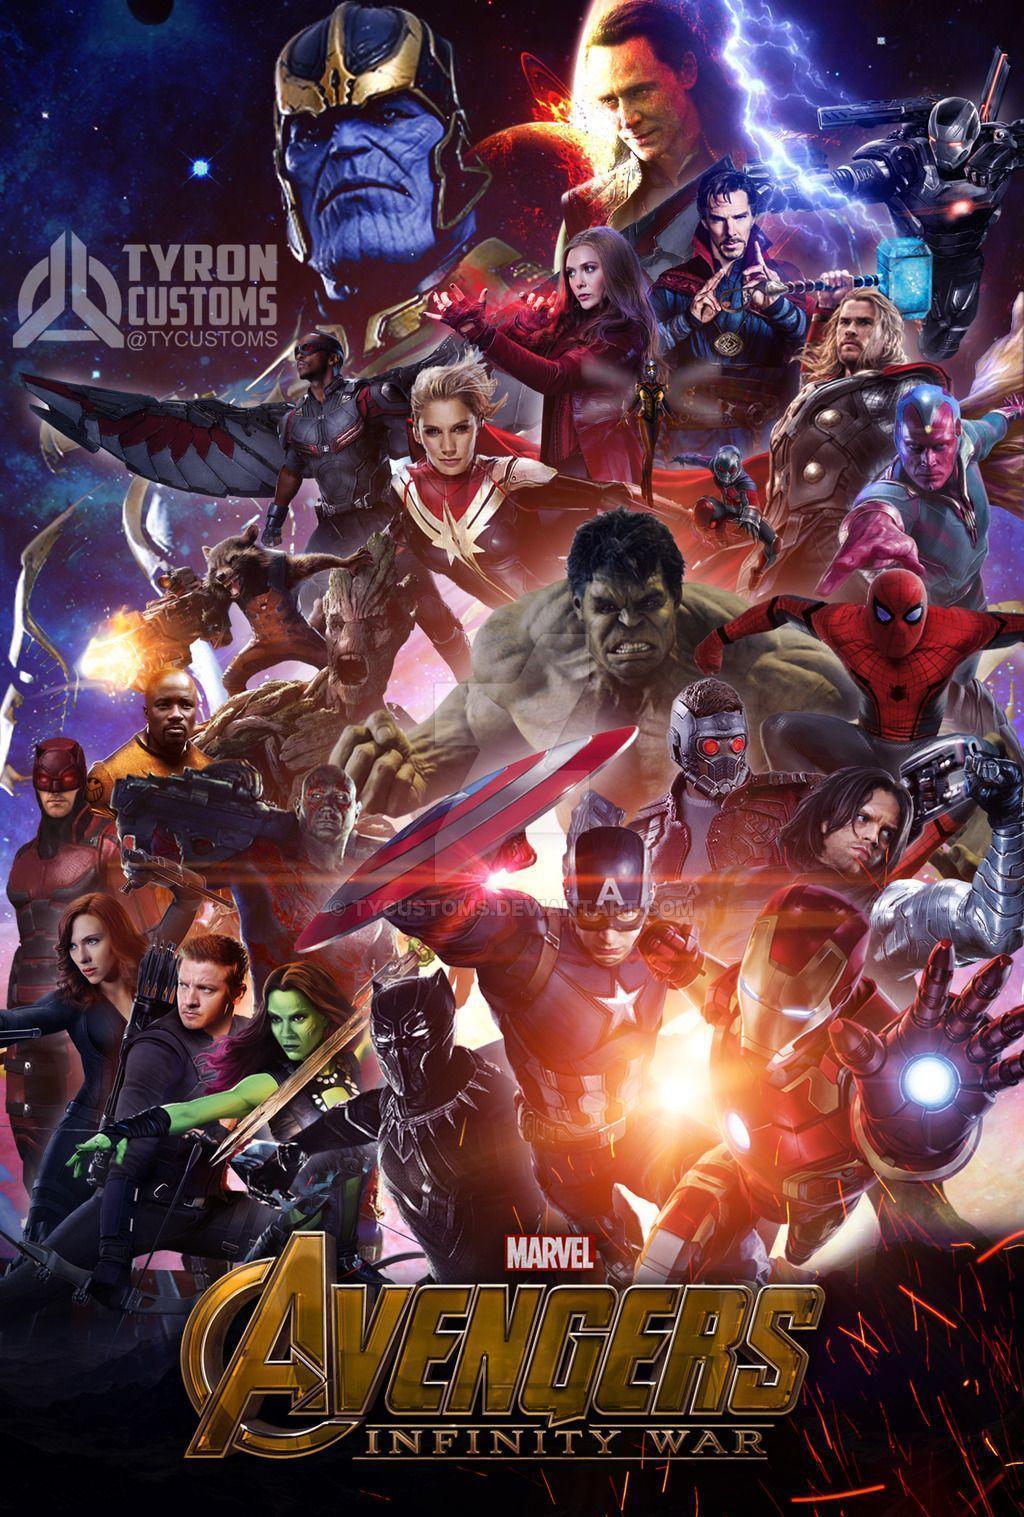 Avengers infinity war wallpapers wallpaper cave - Avengers infinity war wallpaper iphone ...